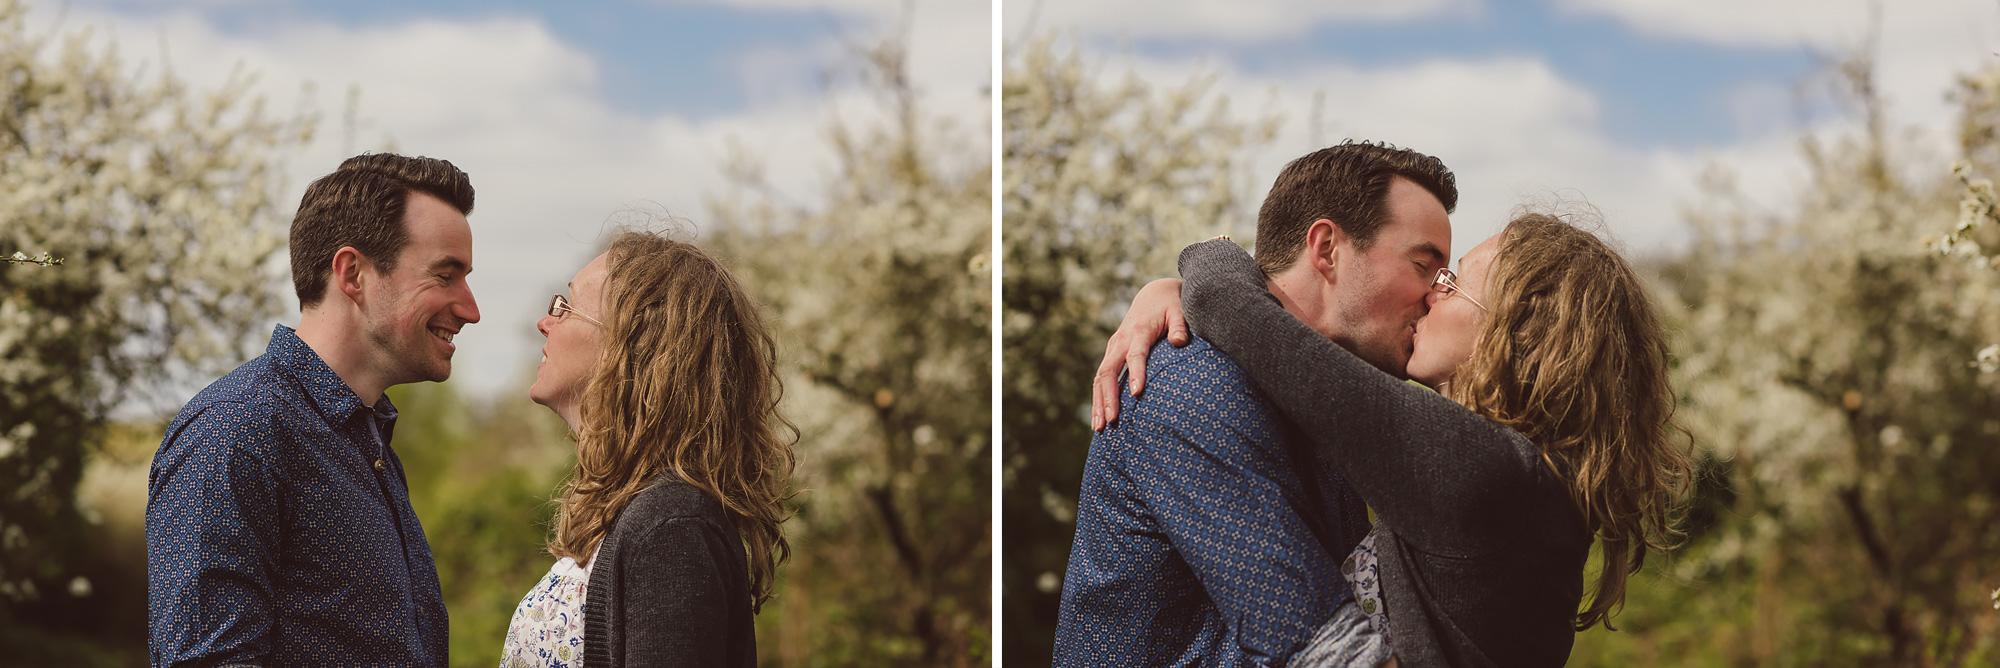 creative-pre-shoot-wedding-photography-blossom-dorset.jpg